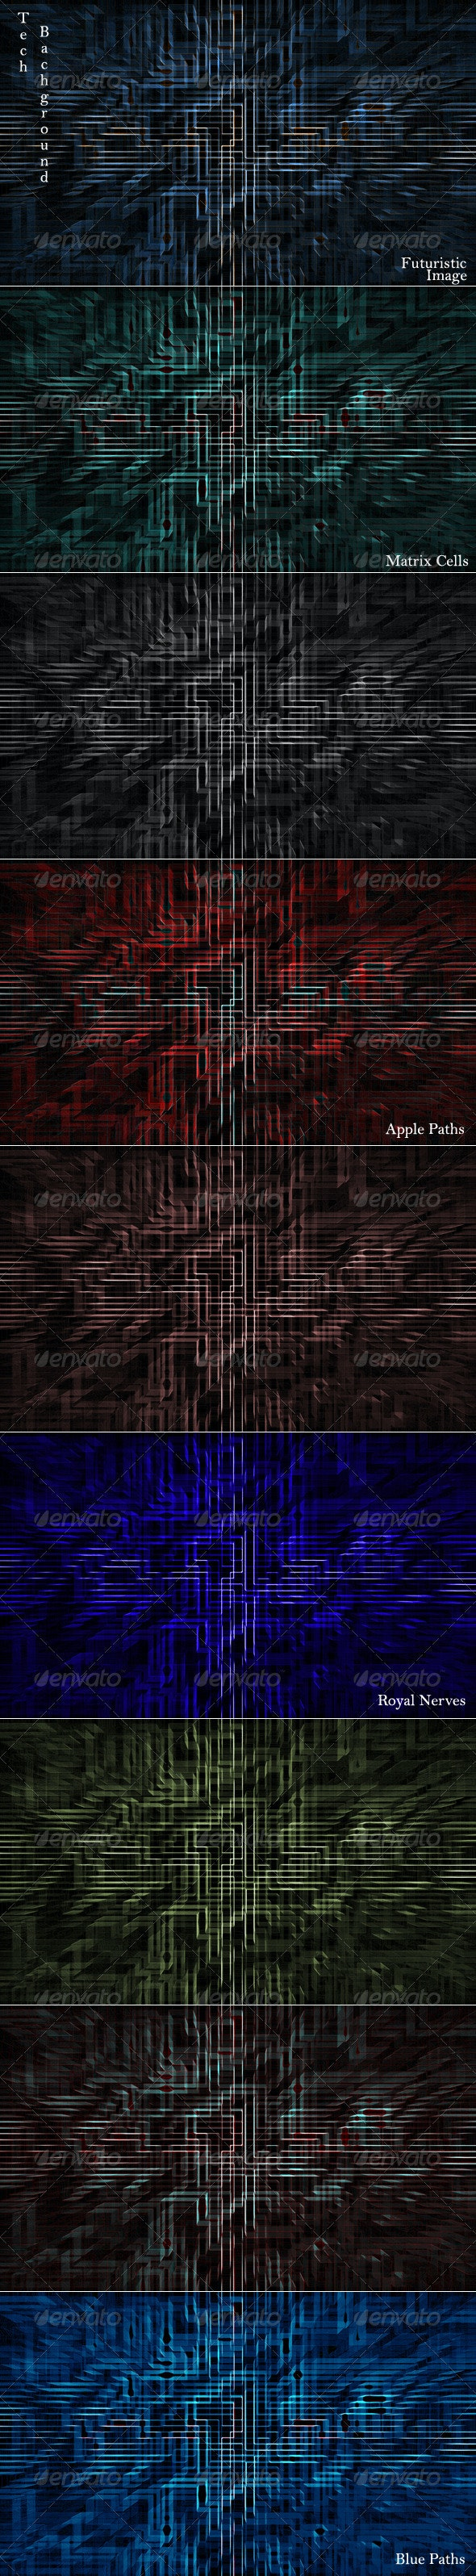 Spicy  Futuristic Tech Background - Tech / Futuristic Backgrounds